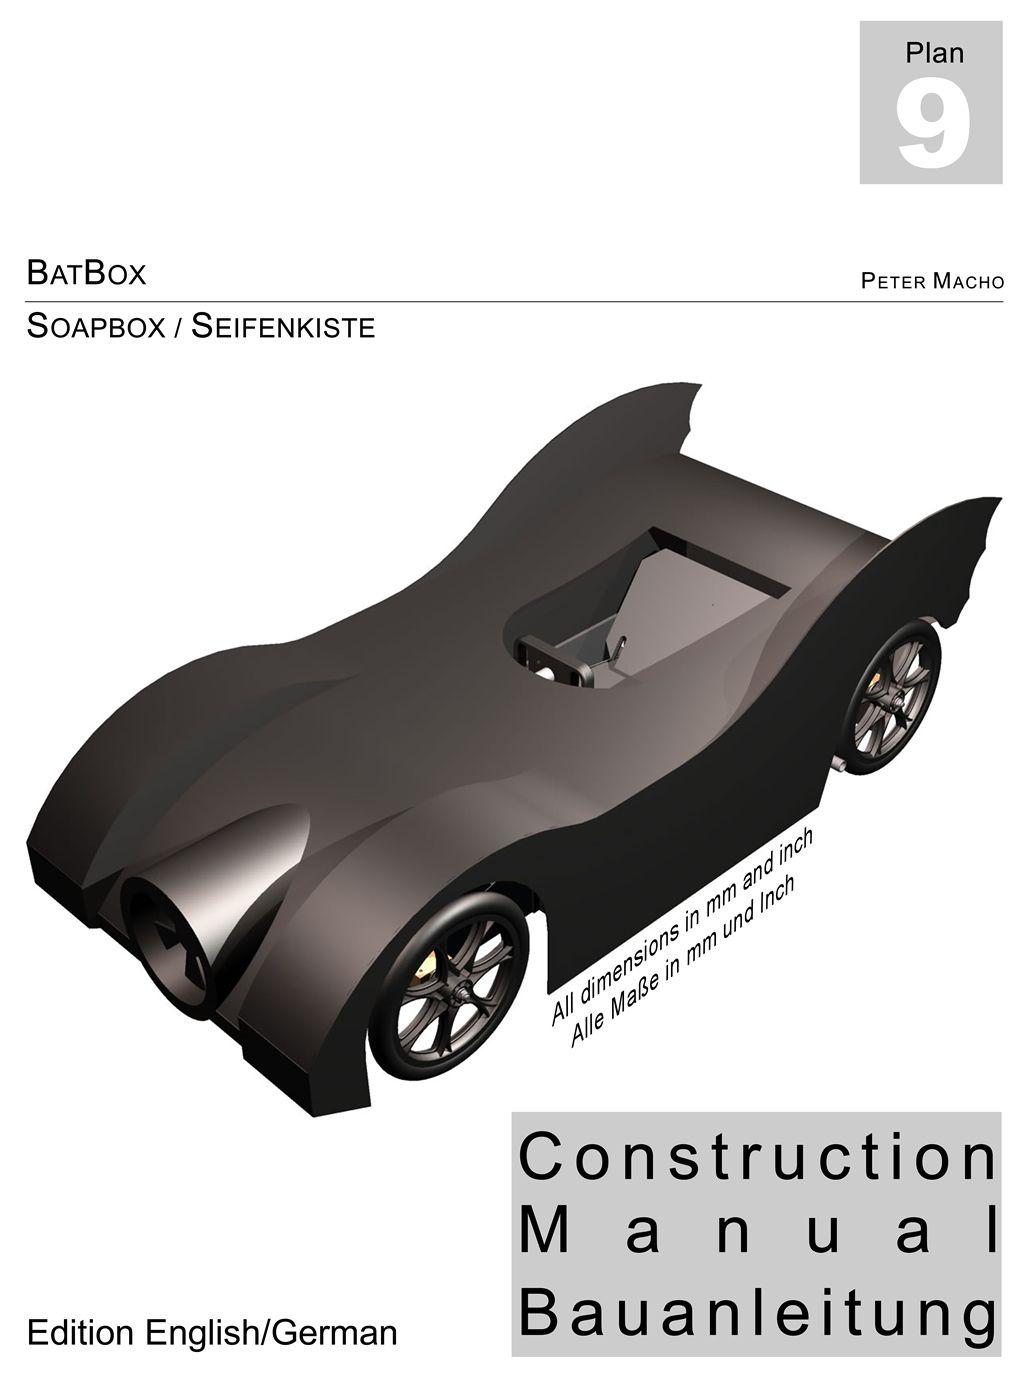 badbox bauanleitung seifenkiste / construction manual soapbox